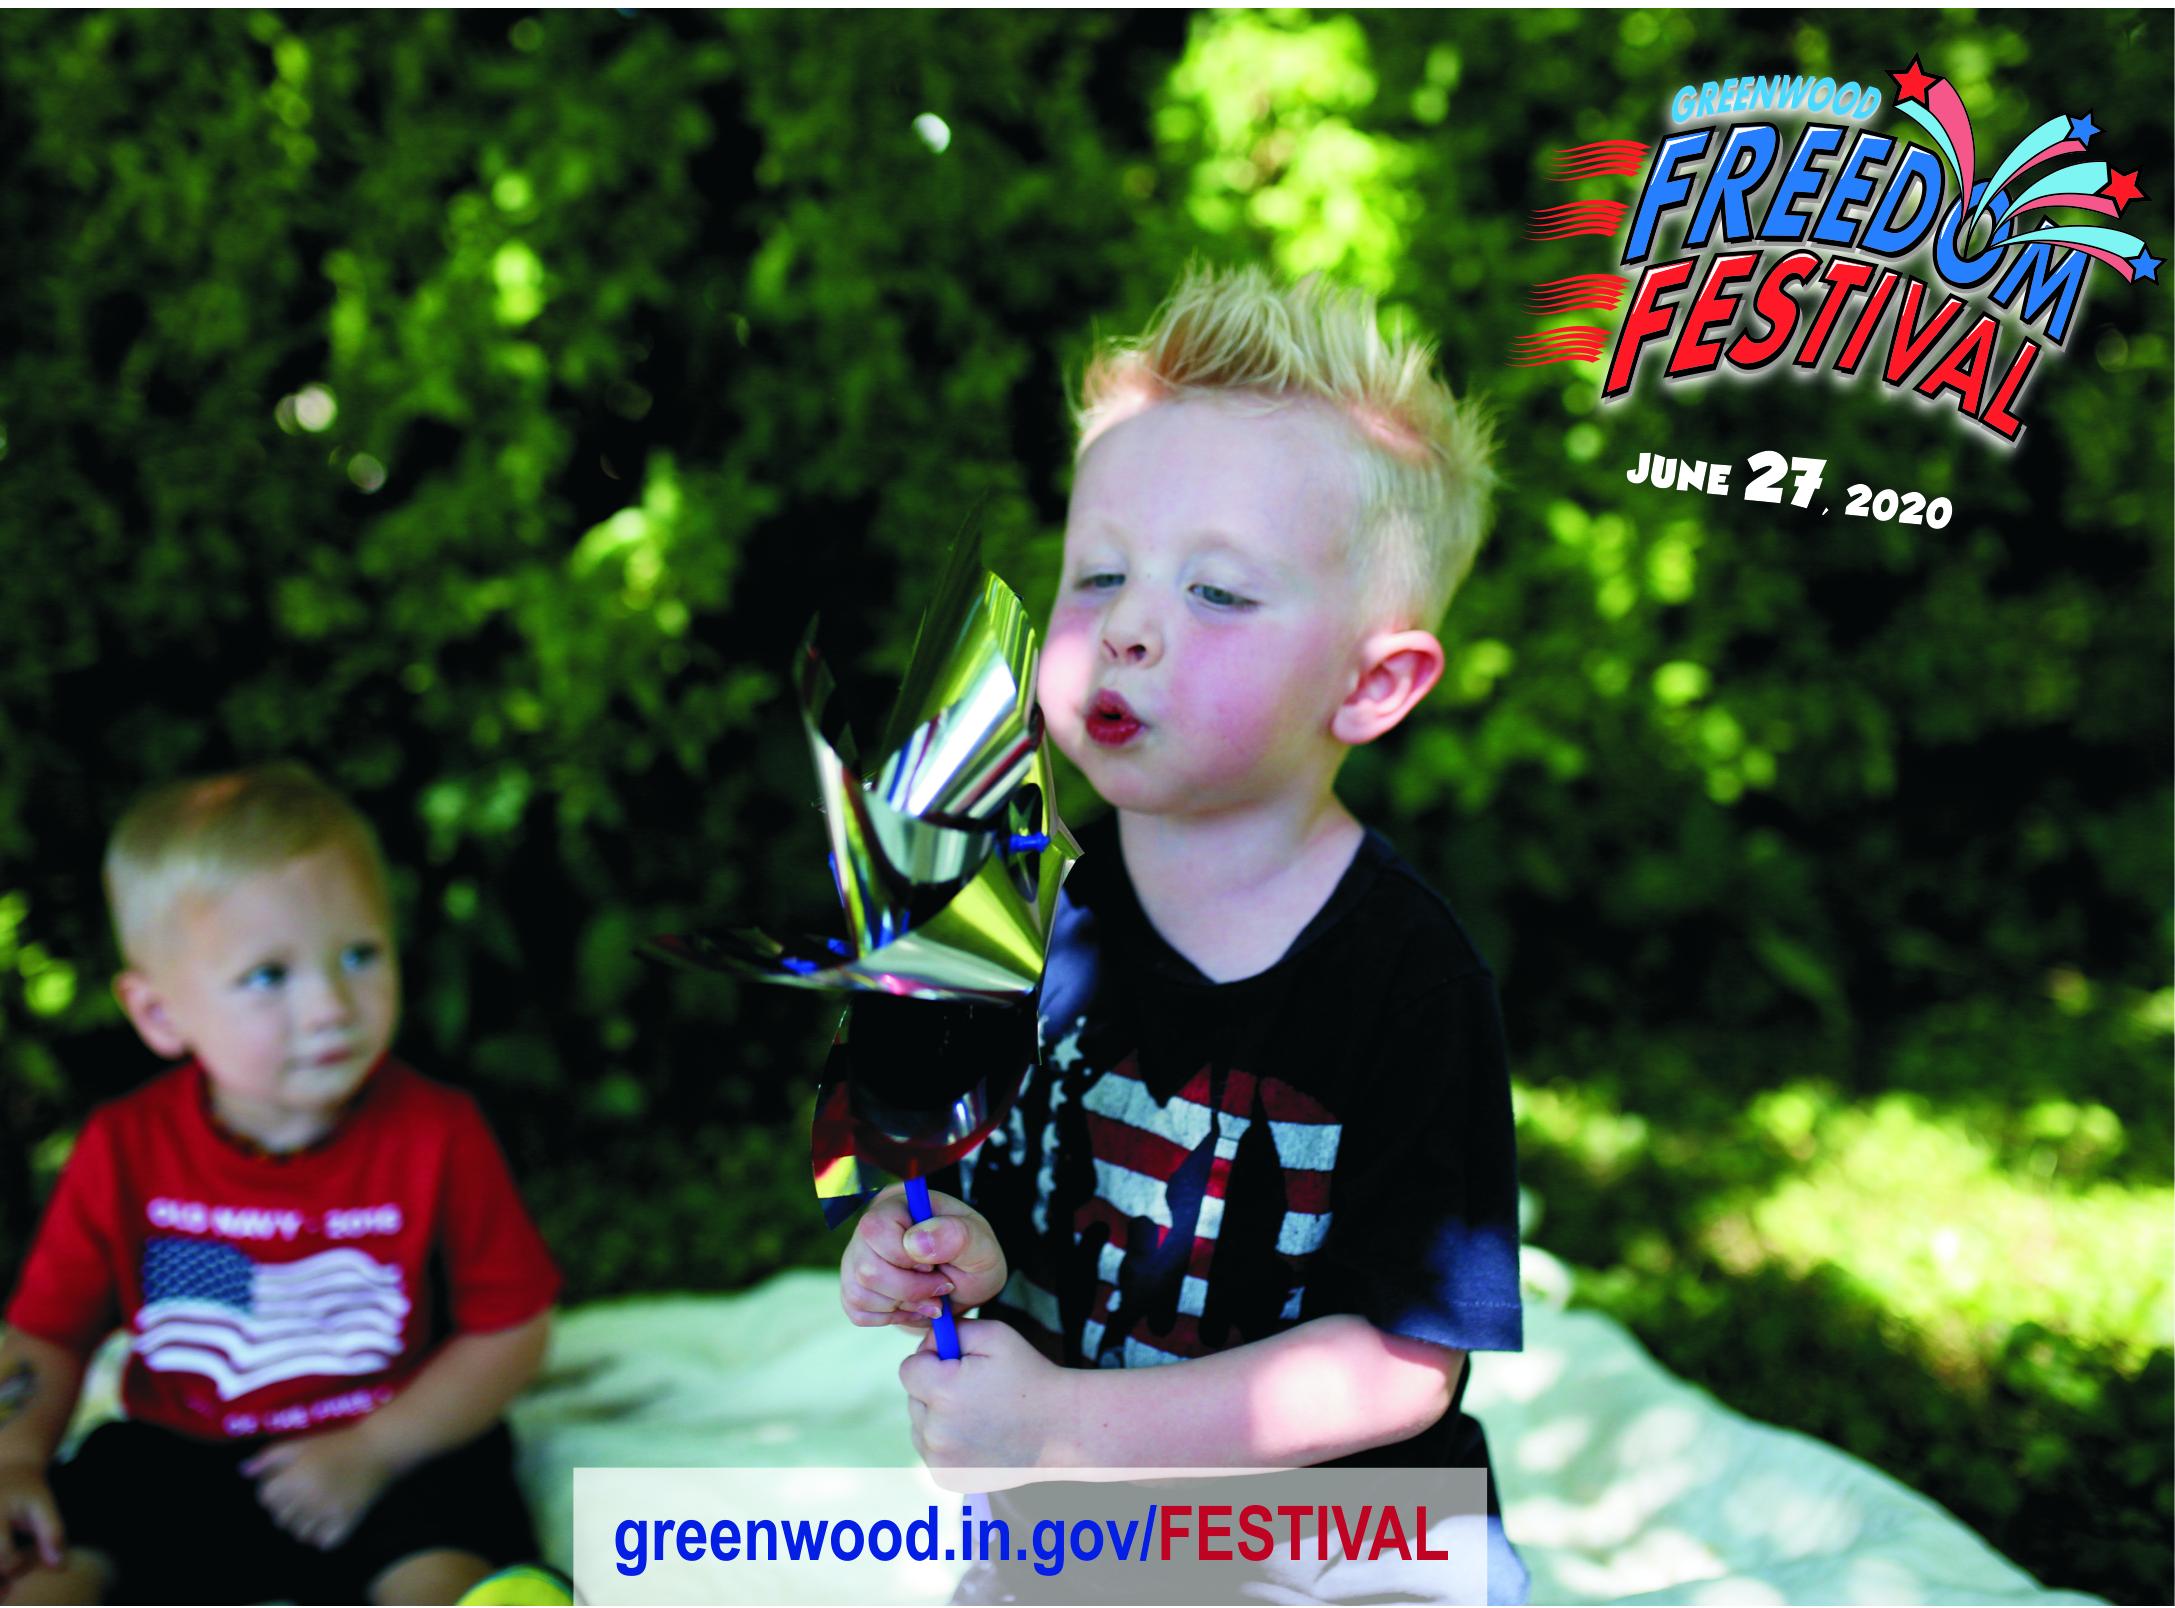 Greenwood Freedom Festival